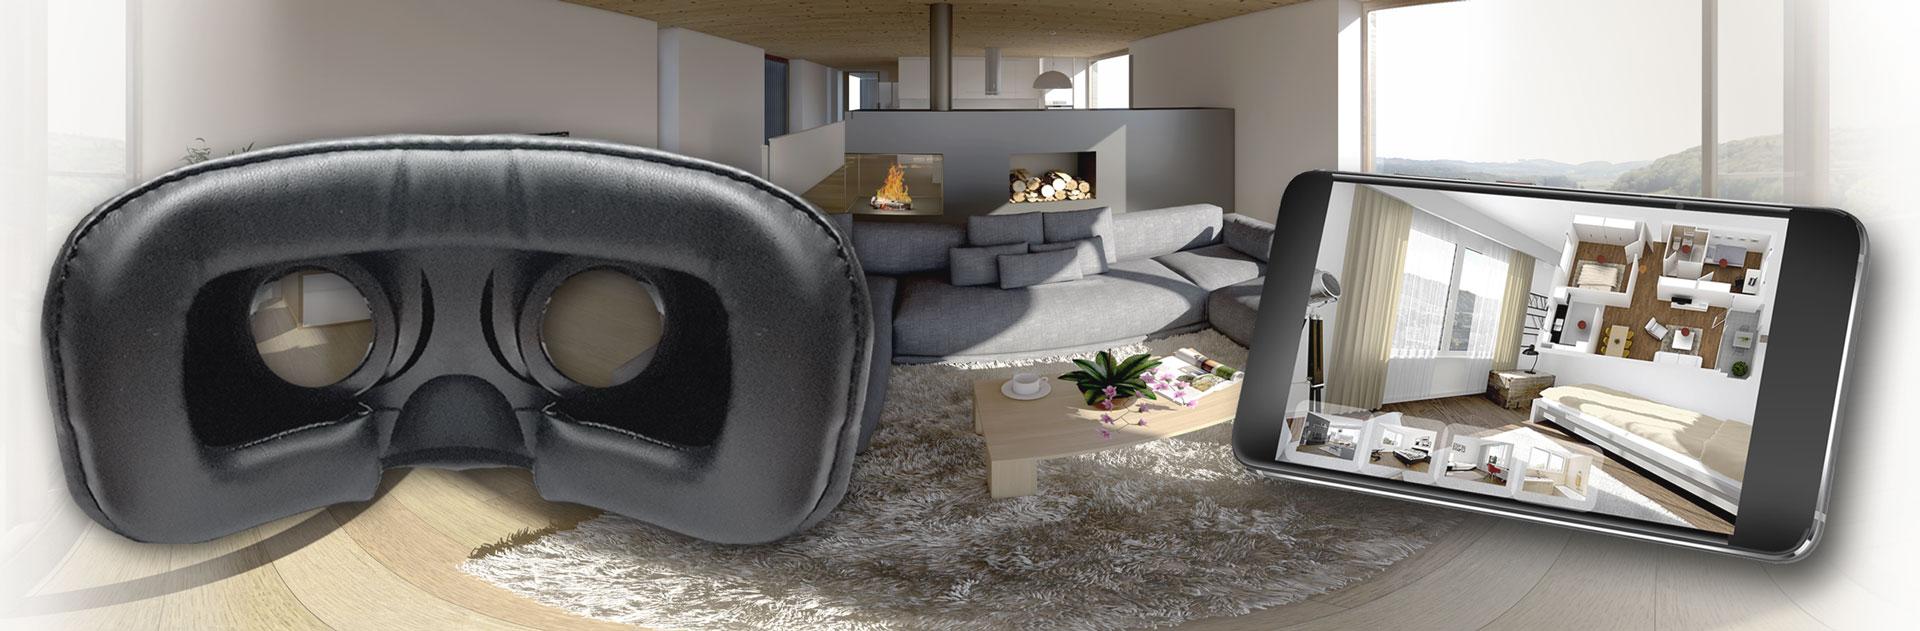 3d-panorama-tour-virtual-reality-smartphone-3.jpg